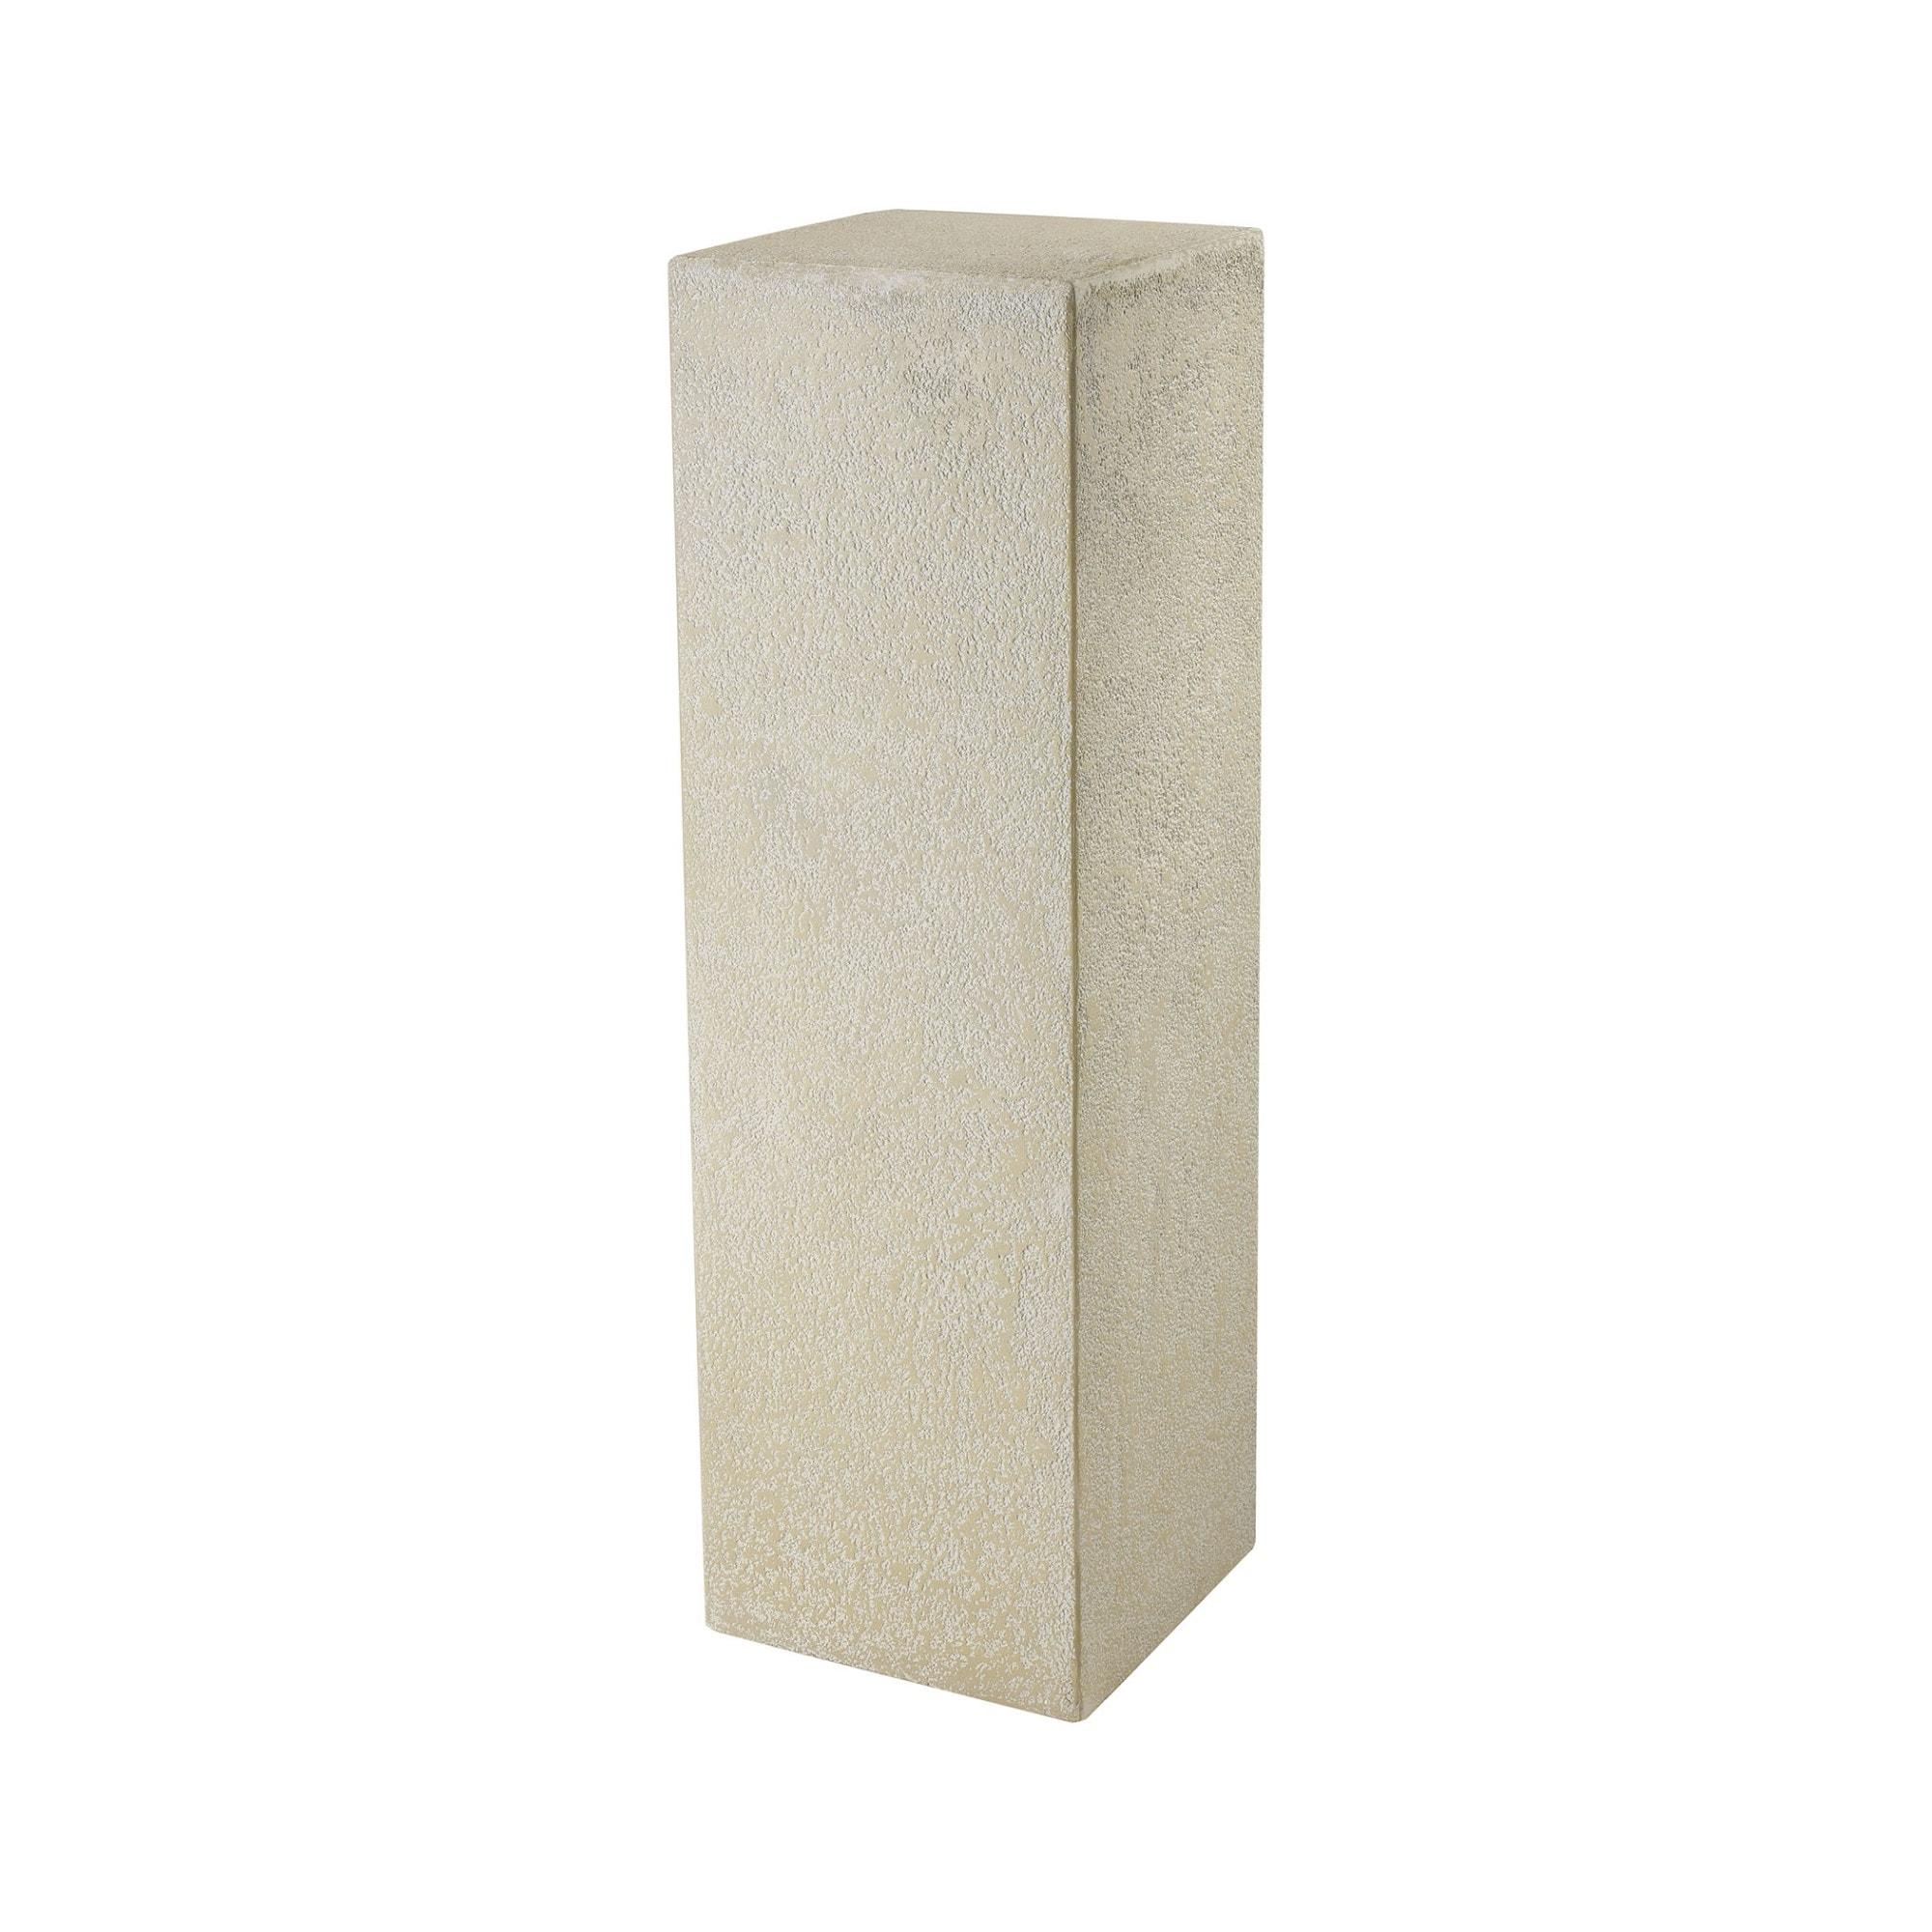 "Elk Home 9166-075 Ivory Tower 47-3/16"" Tall Fiberglass Pedestal Plant Stand thumbnail"